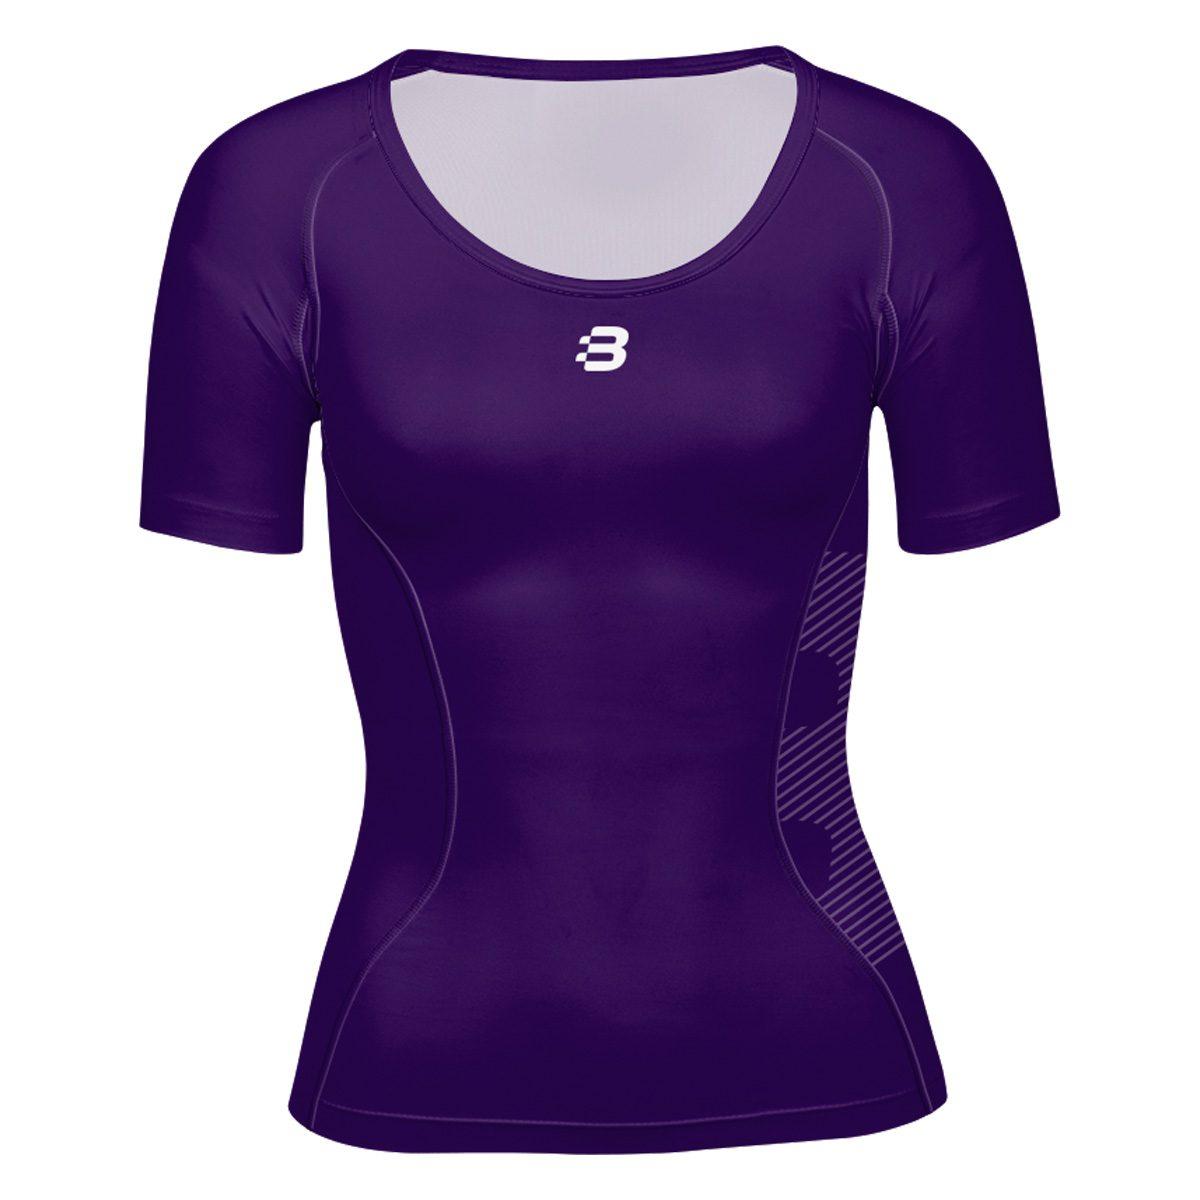 Ladies Compression T-Shirt - Dark Purple - Blackchrome